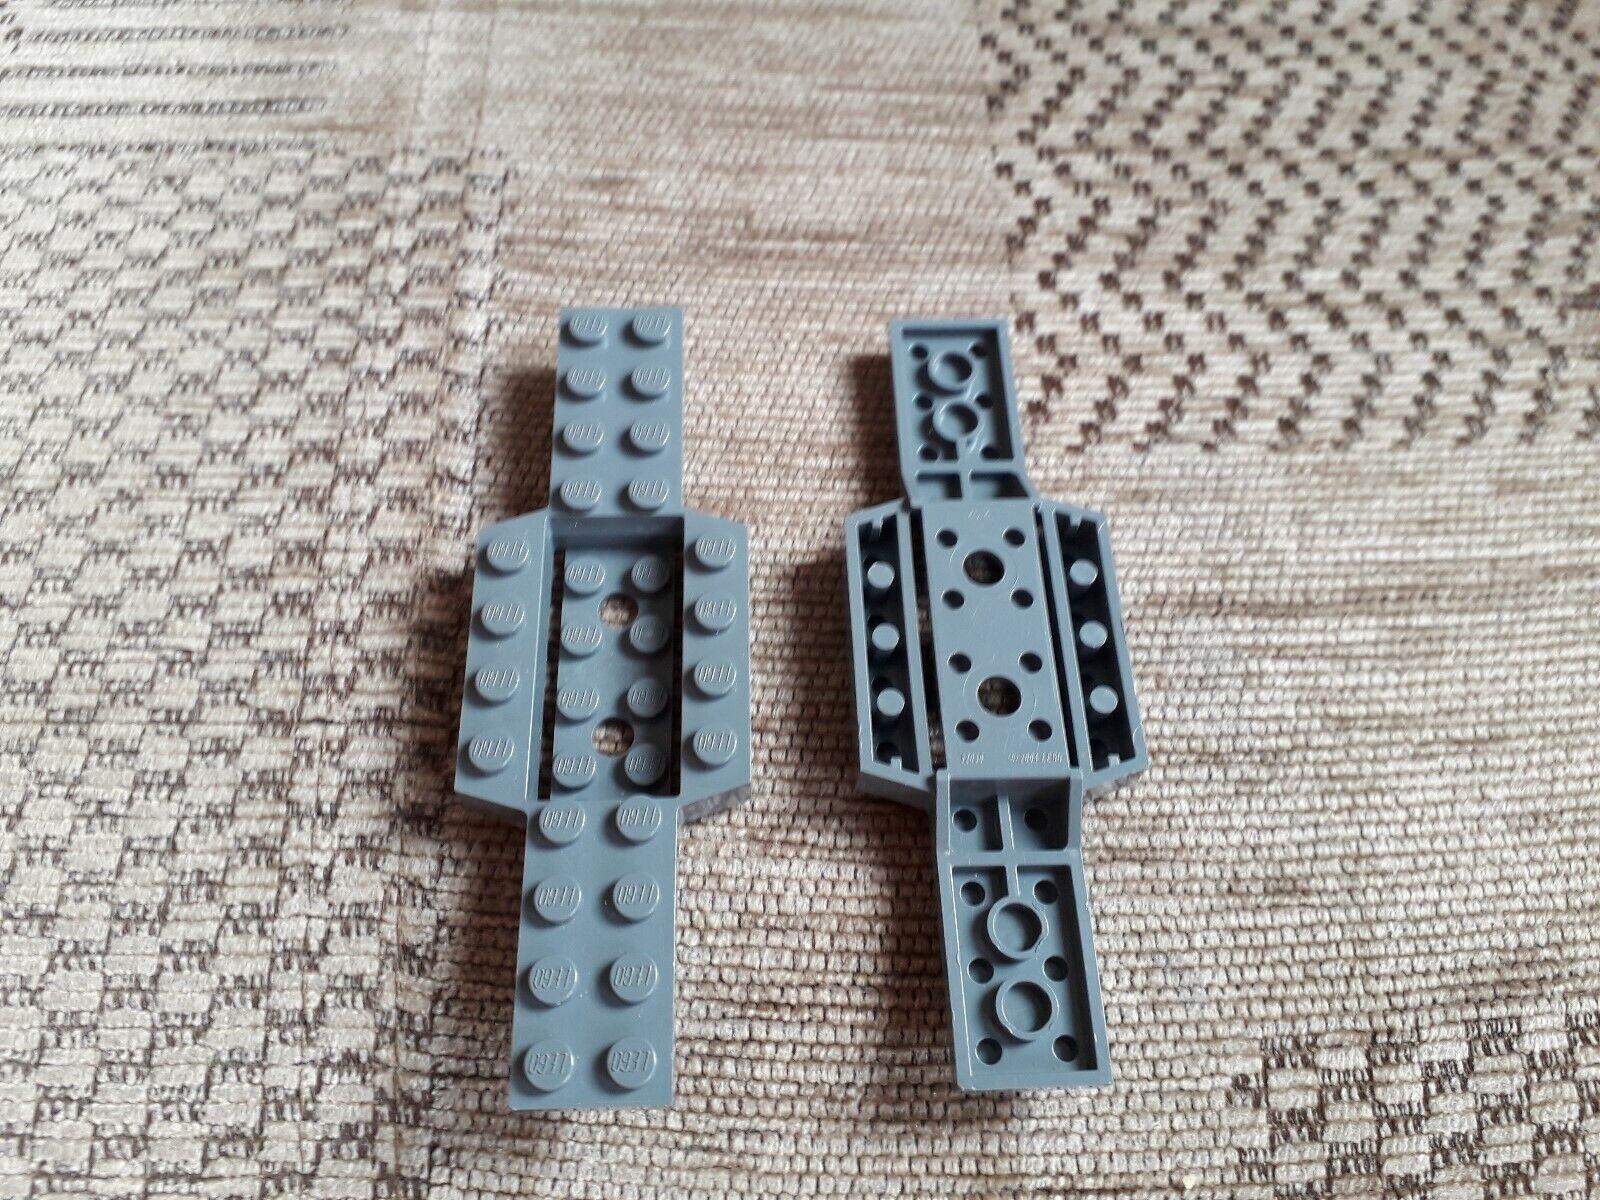 2460 Dark Bluish Grey x 4 Lego Tile 2 x 2 with centre pin Part No